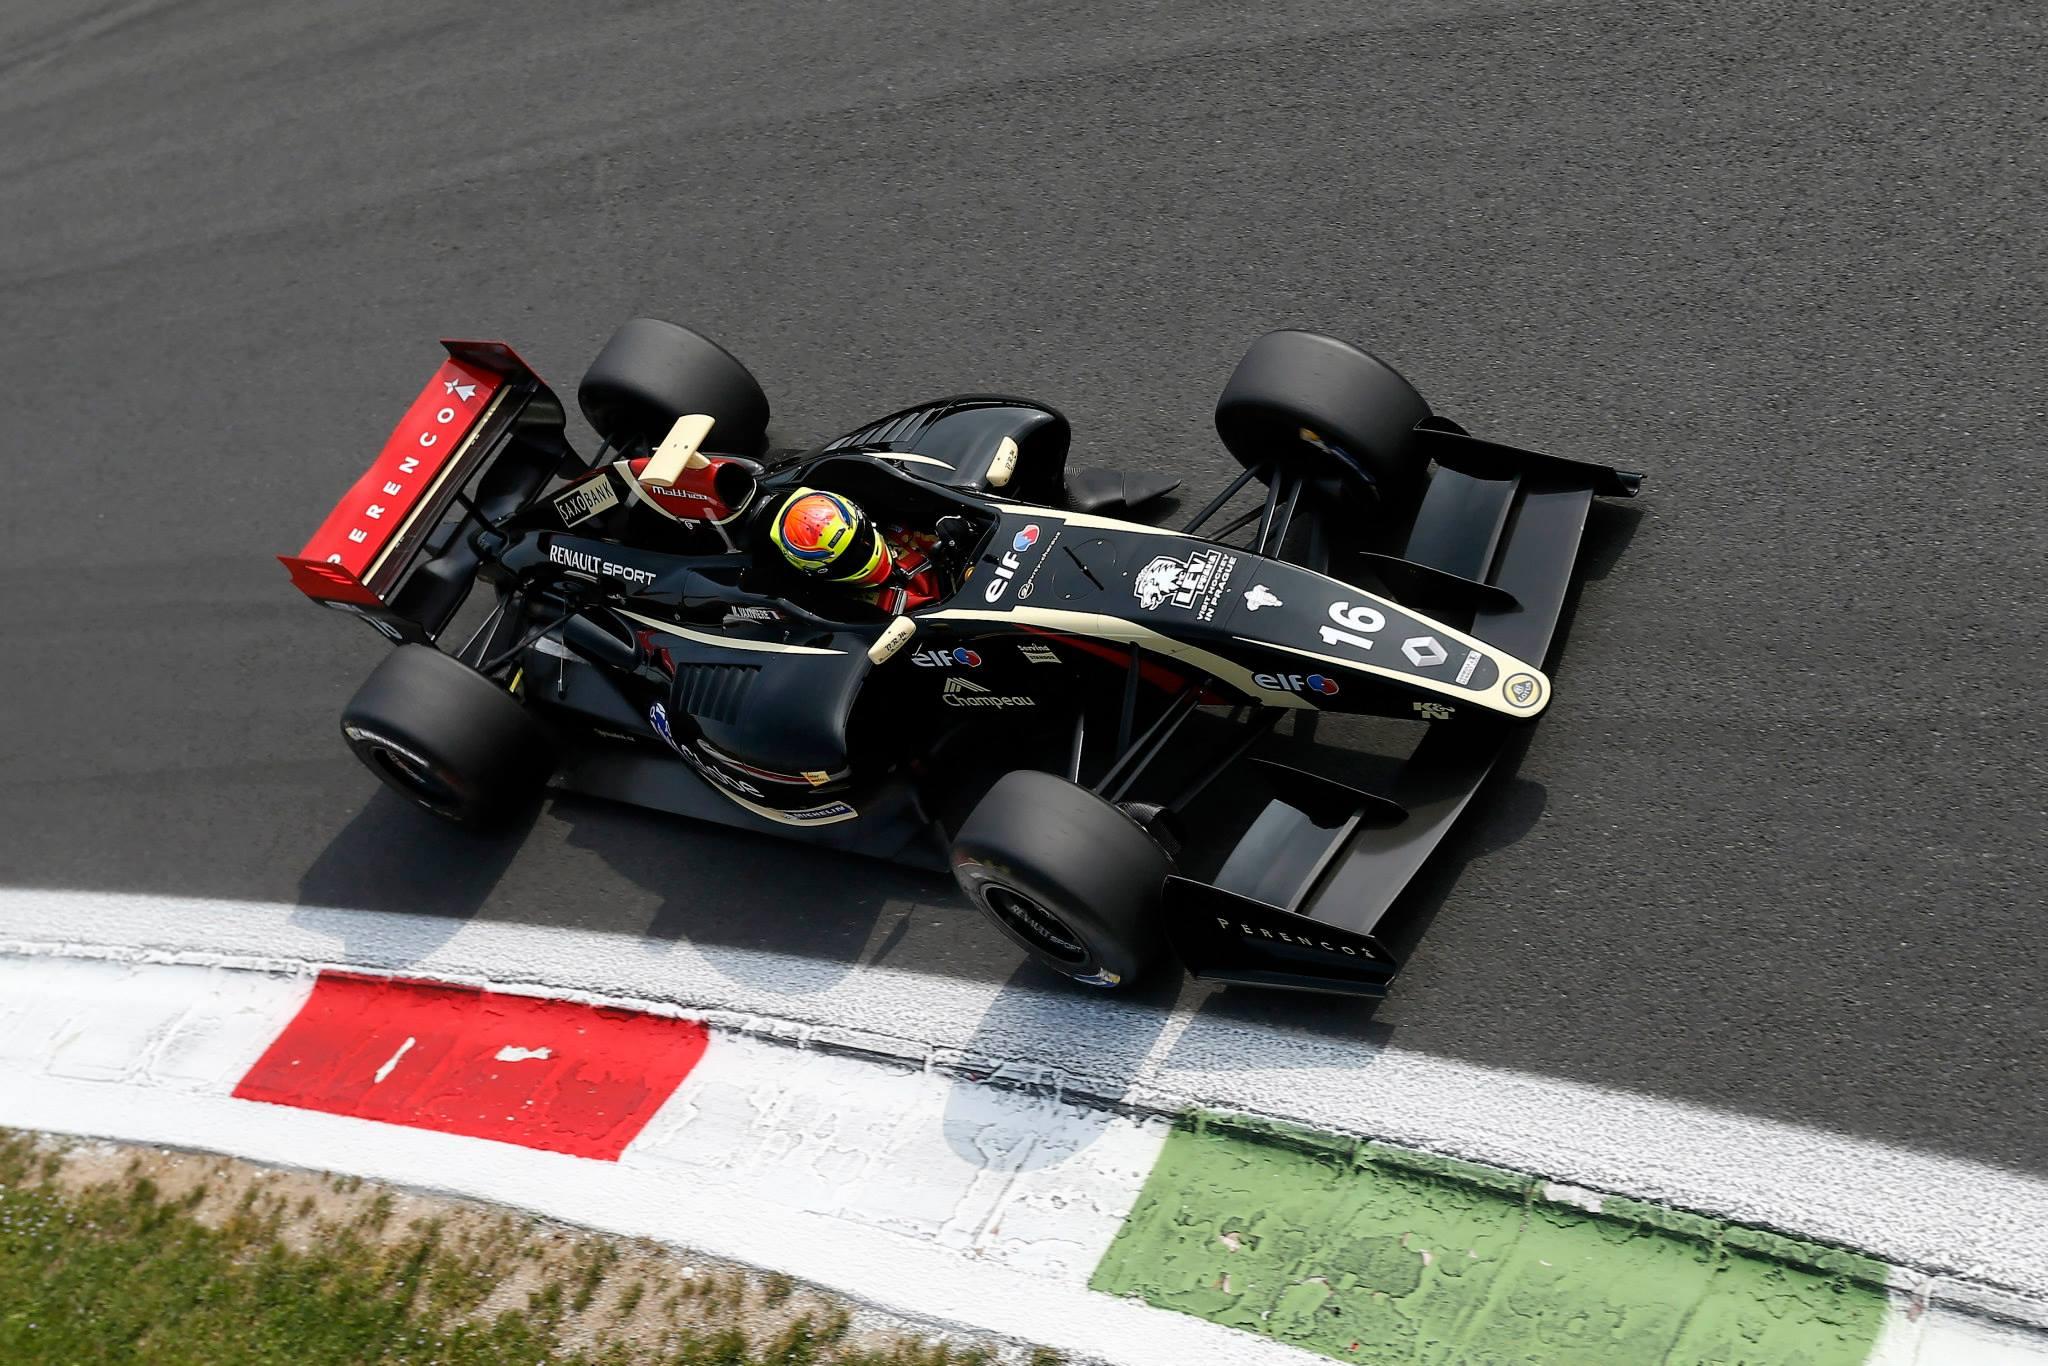 2014 Formula Renault 3.5 Series - Monza - Matthieu Vaxiviere